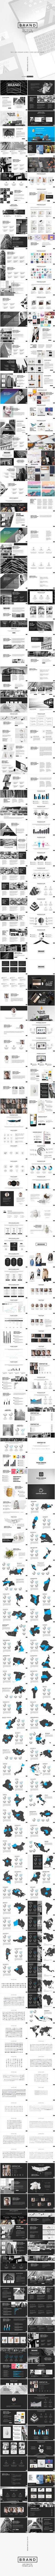 Brand Keynote Template - Creative Keynote Templates